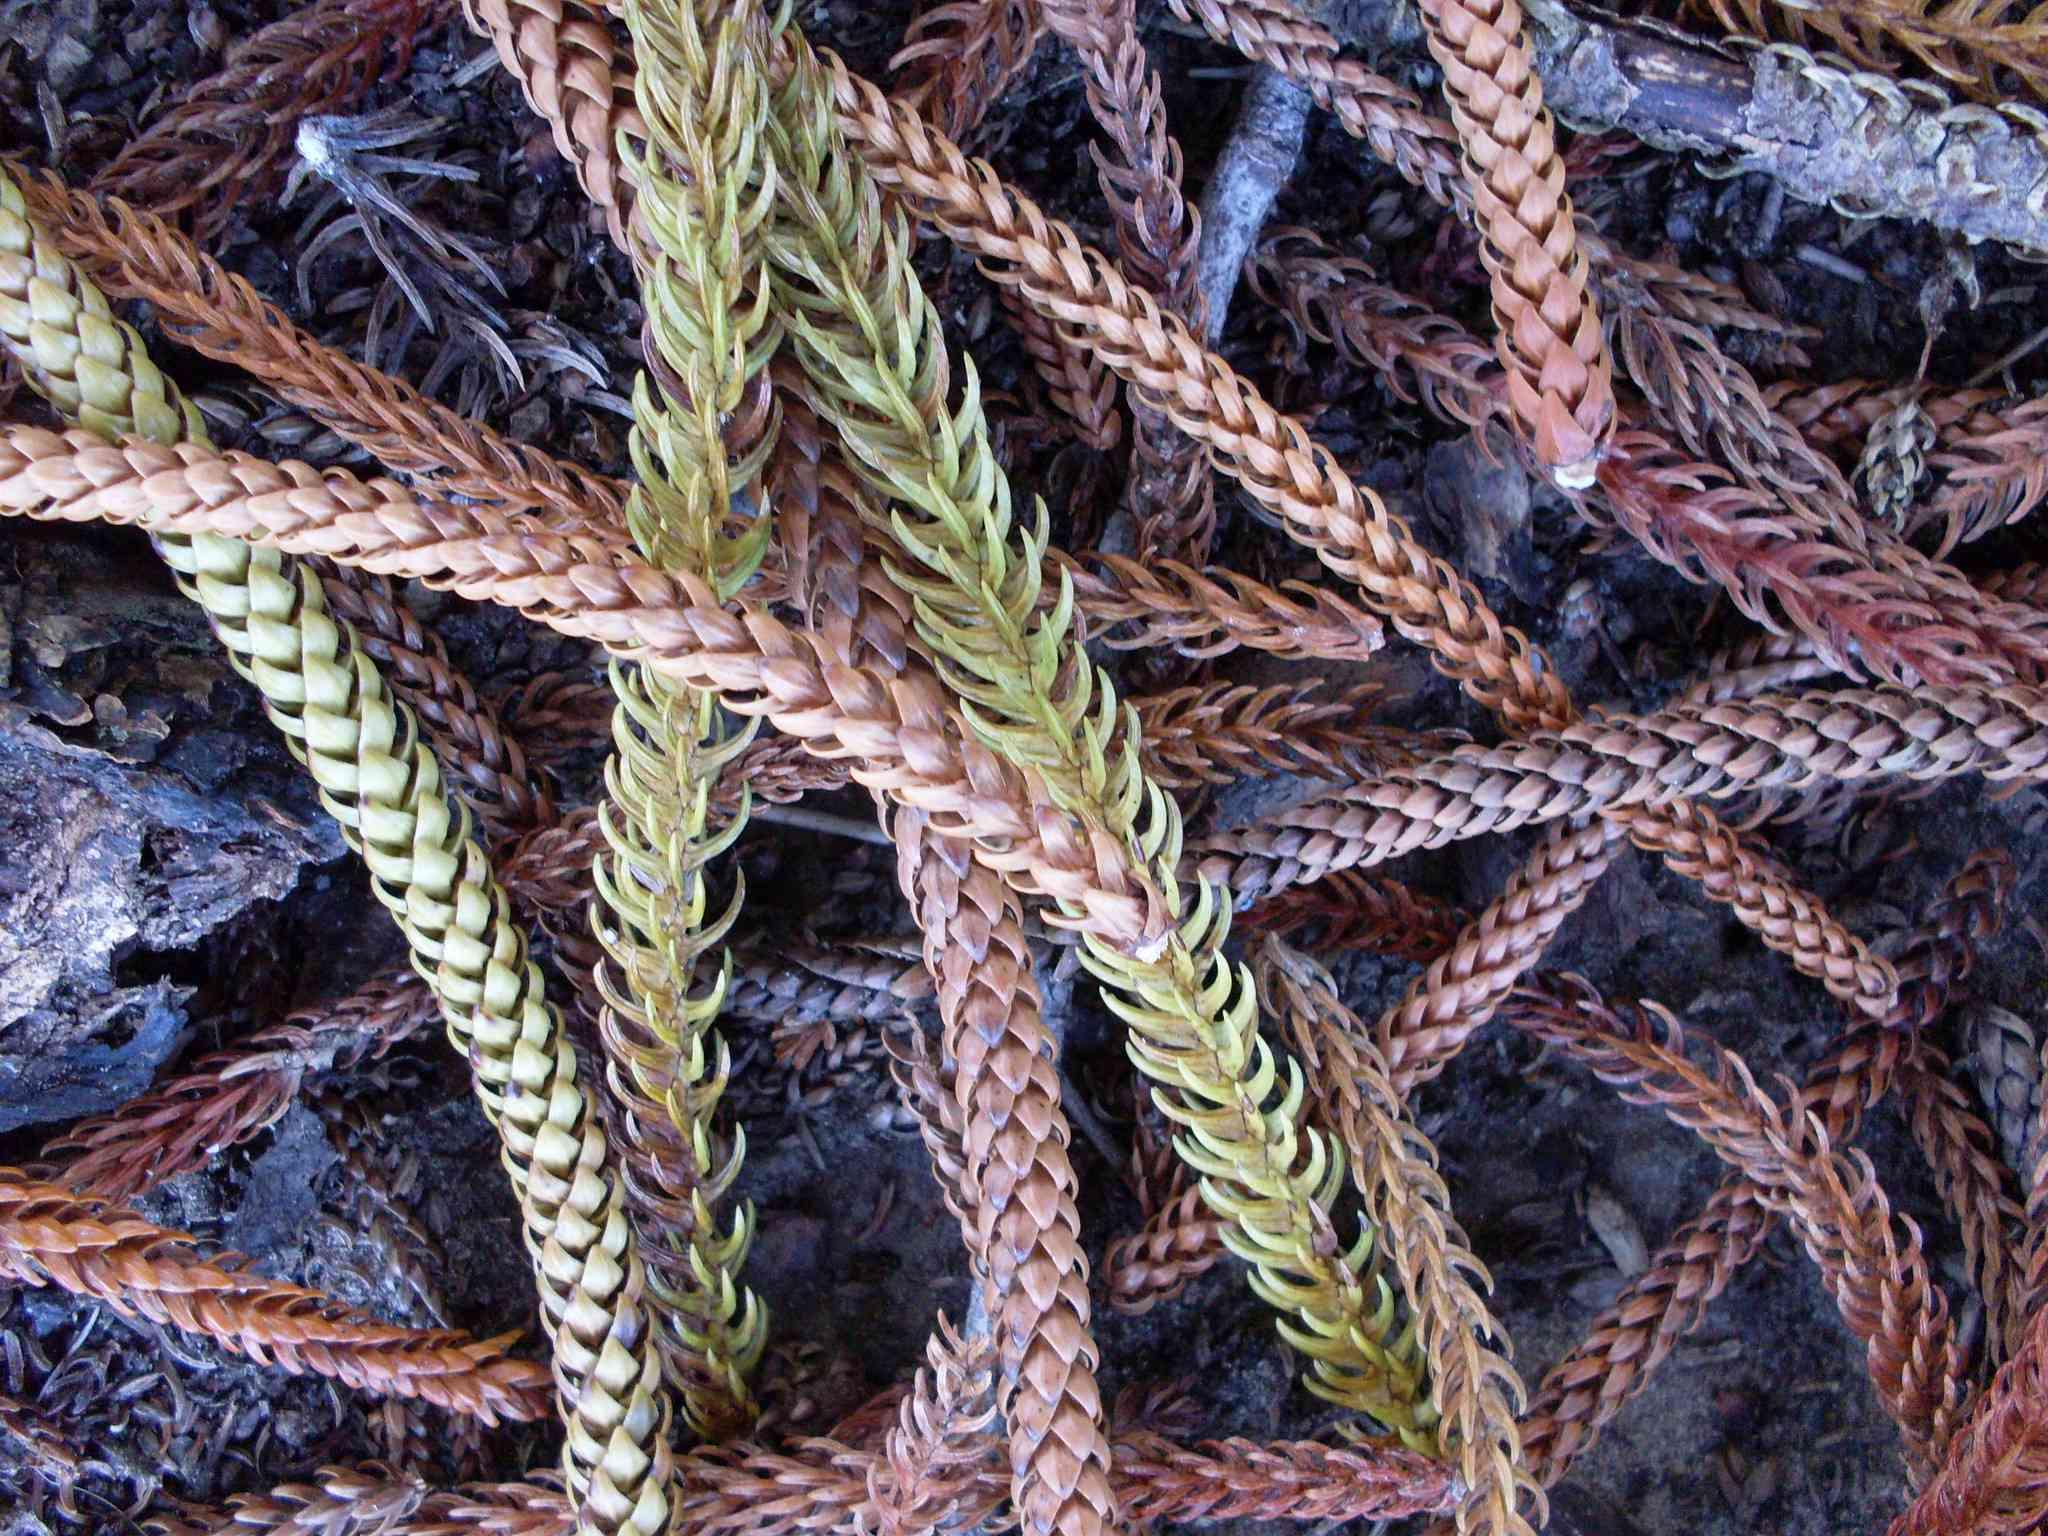 Dead brown Norfolk pine needles on the ground.